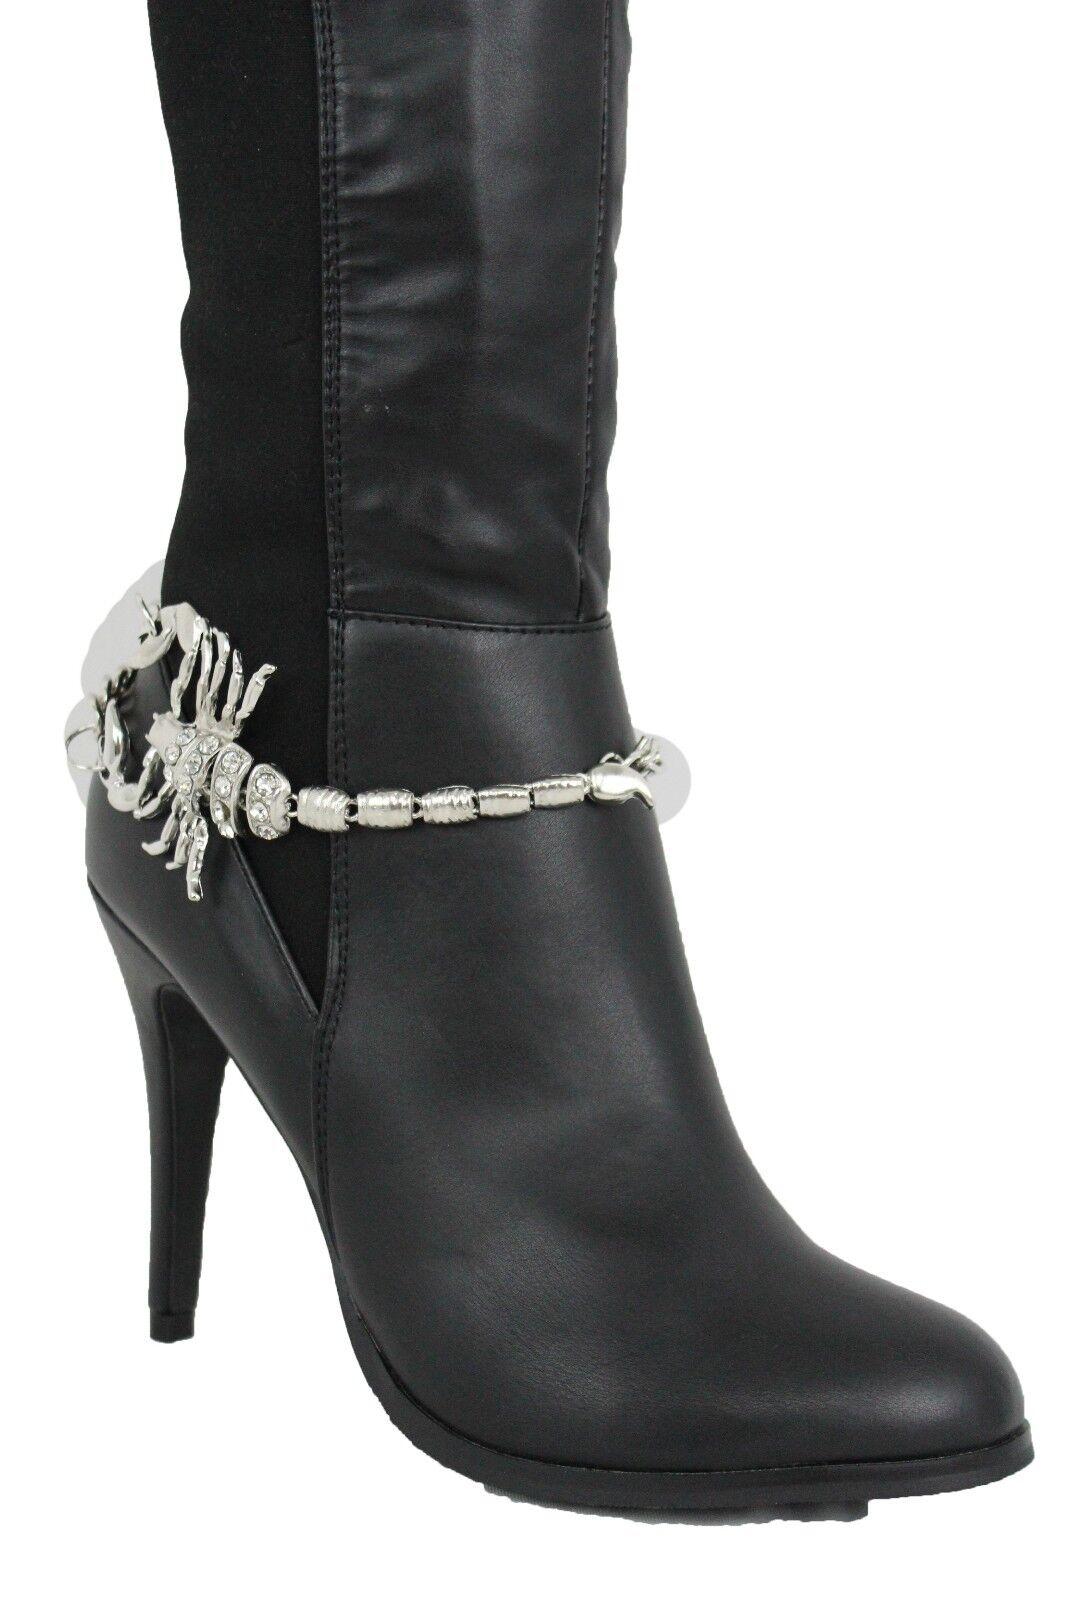 Women Boot Silver Metal Chain Bracelet Shoe Anklet Bling Scorpion Charm Jewelry